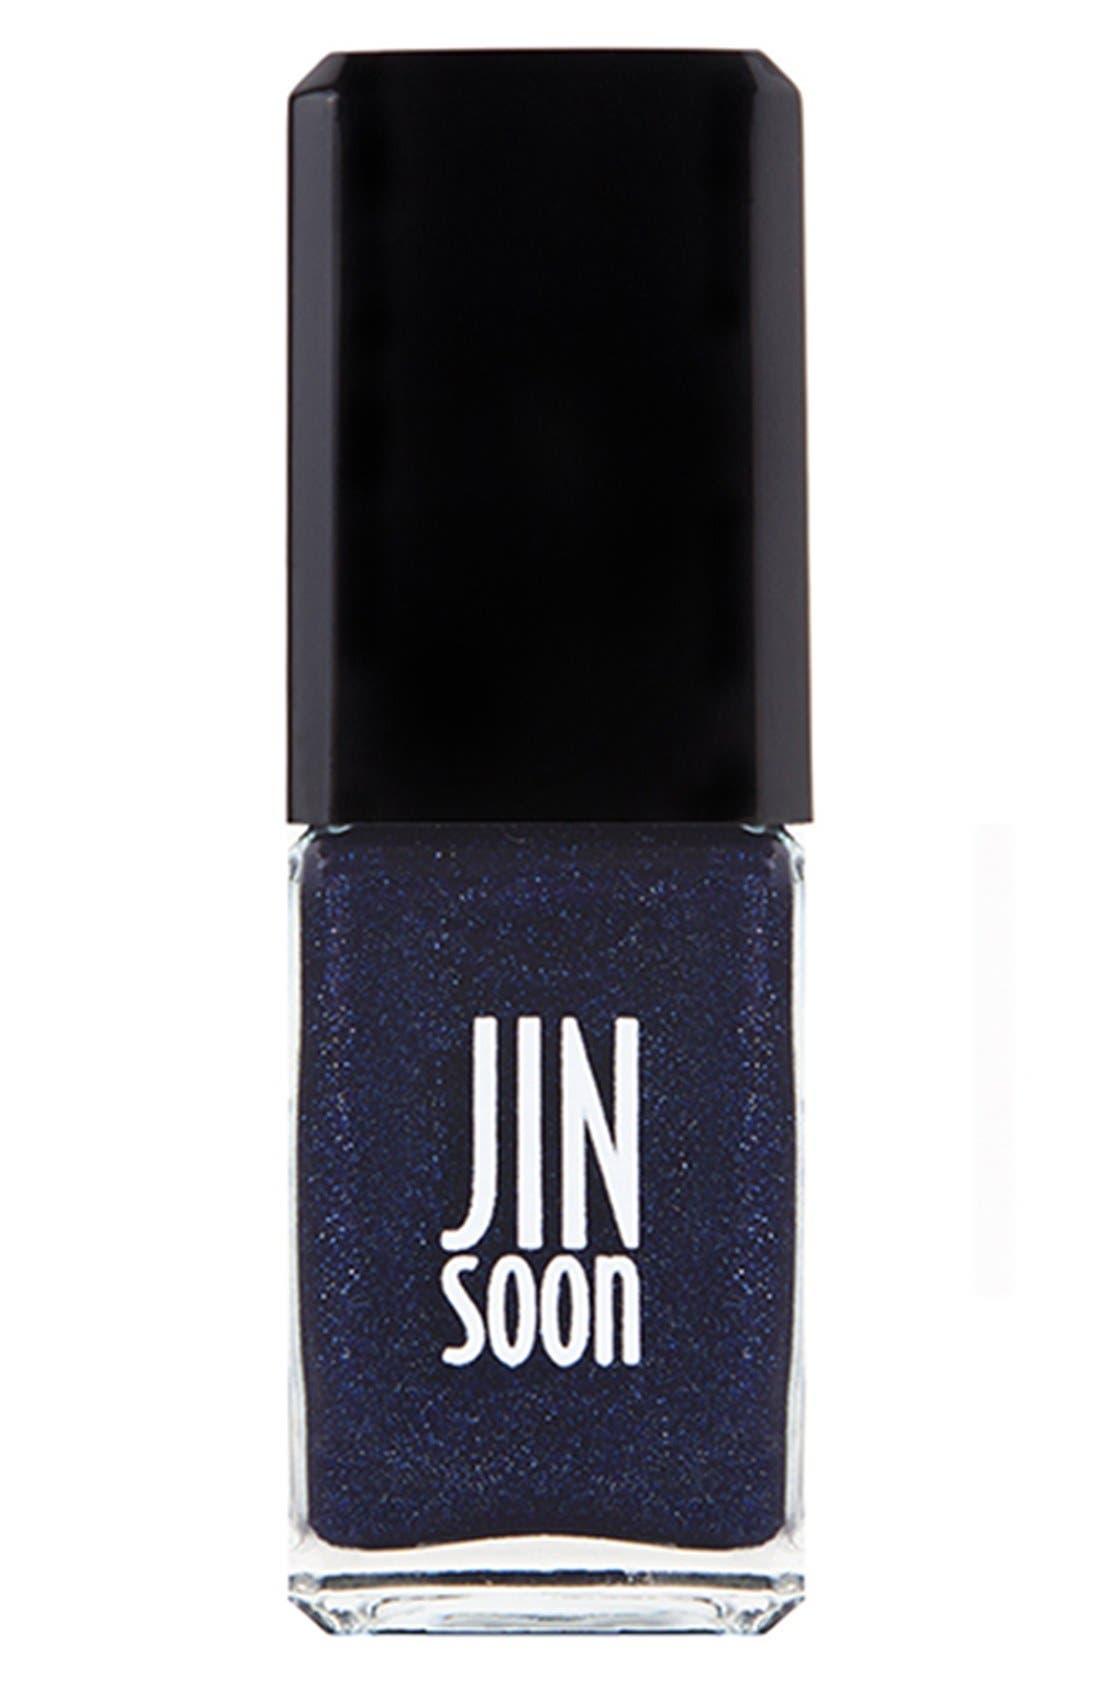 JINsoon 'Azurite' Nail Lacquer